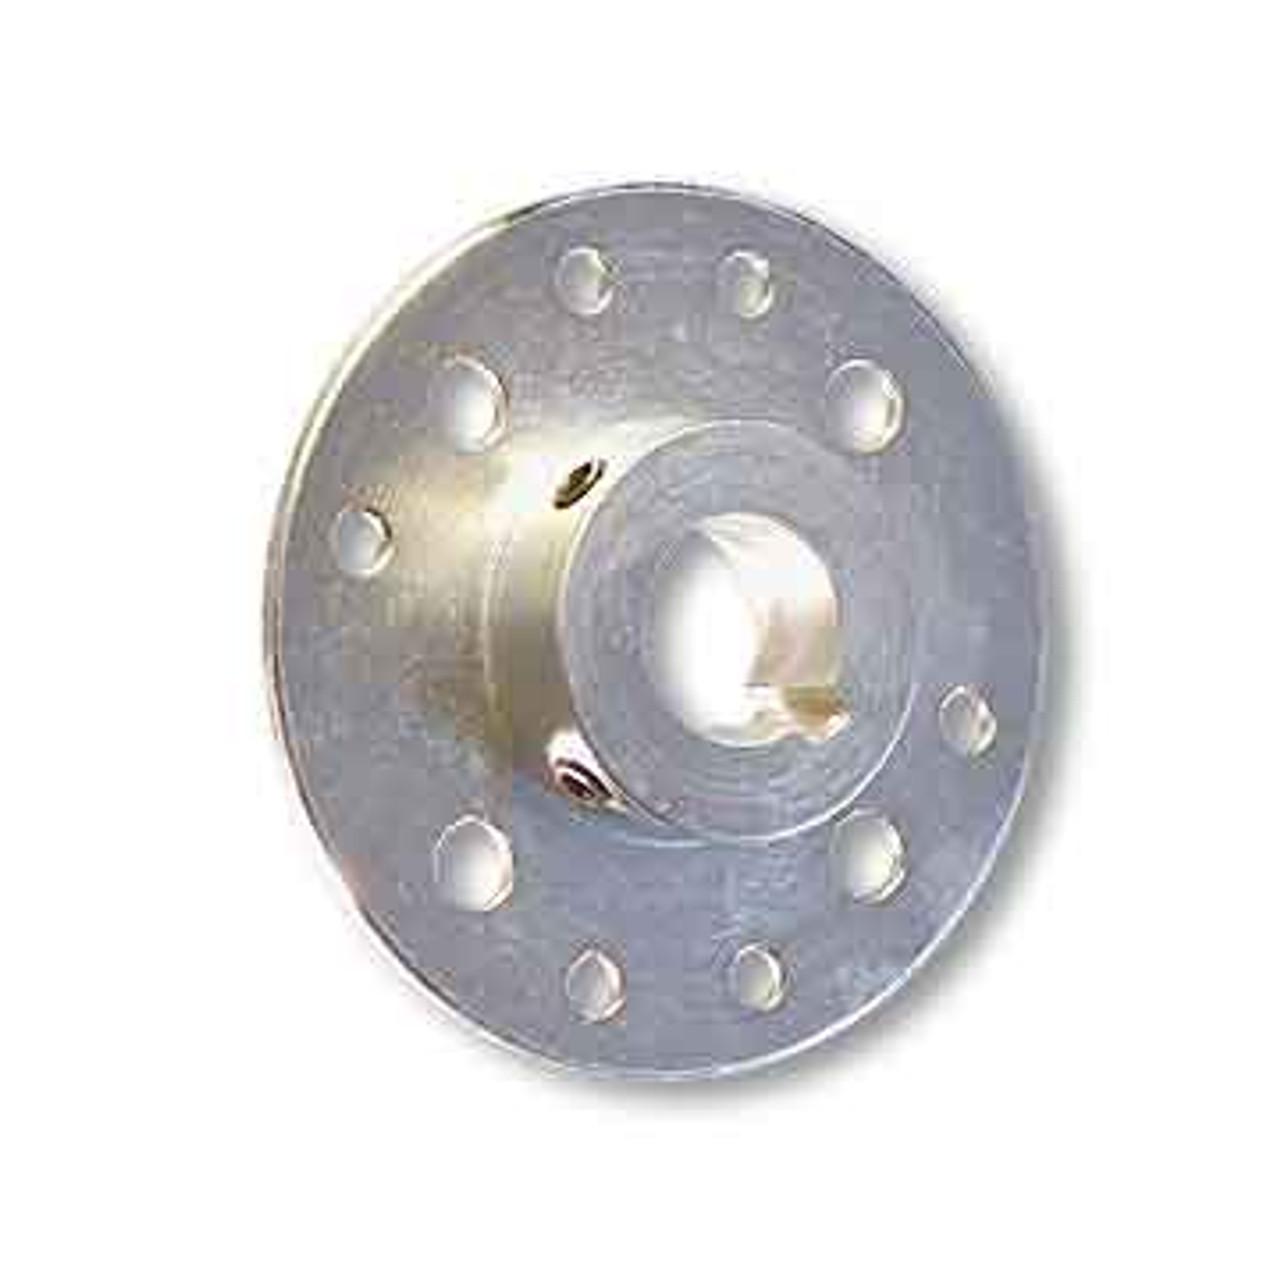 "Mini-Hub, Steel, Zinc Plated, 1-1/4"" Bore, Set Screws Only"